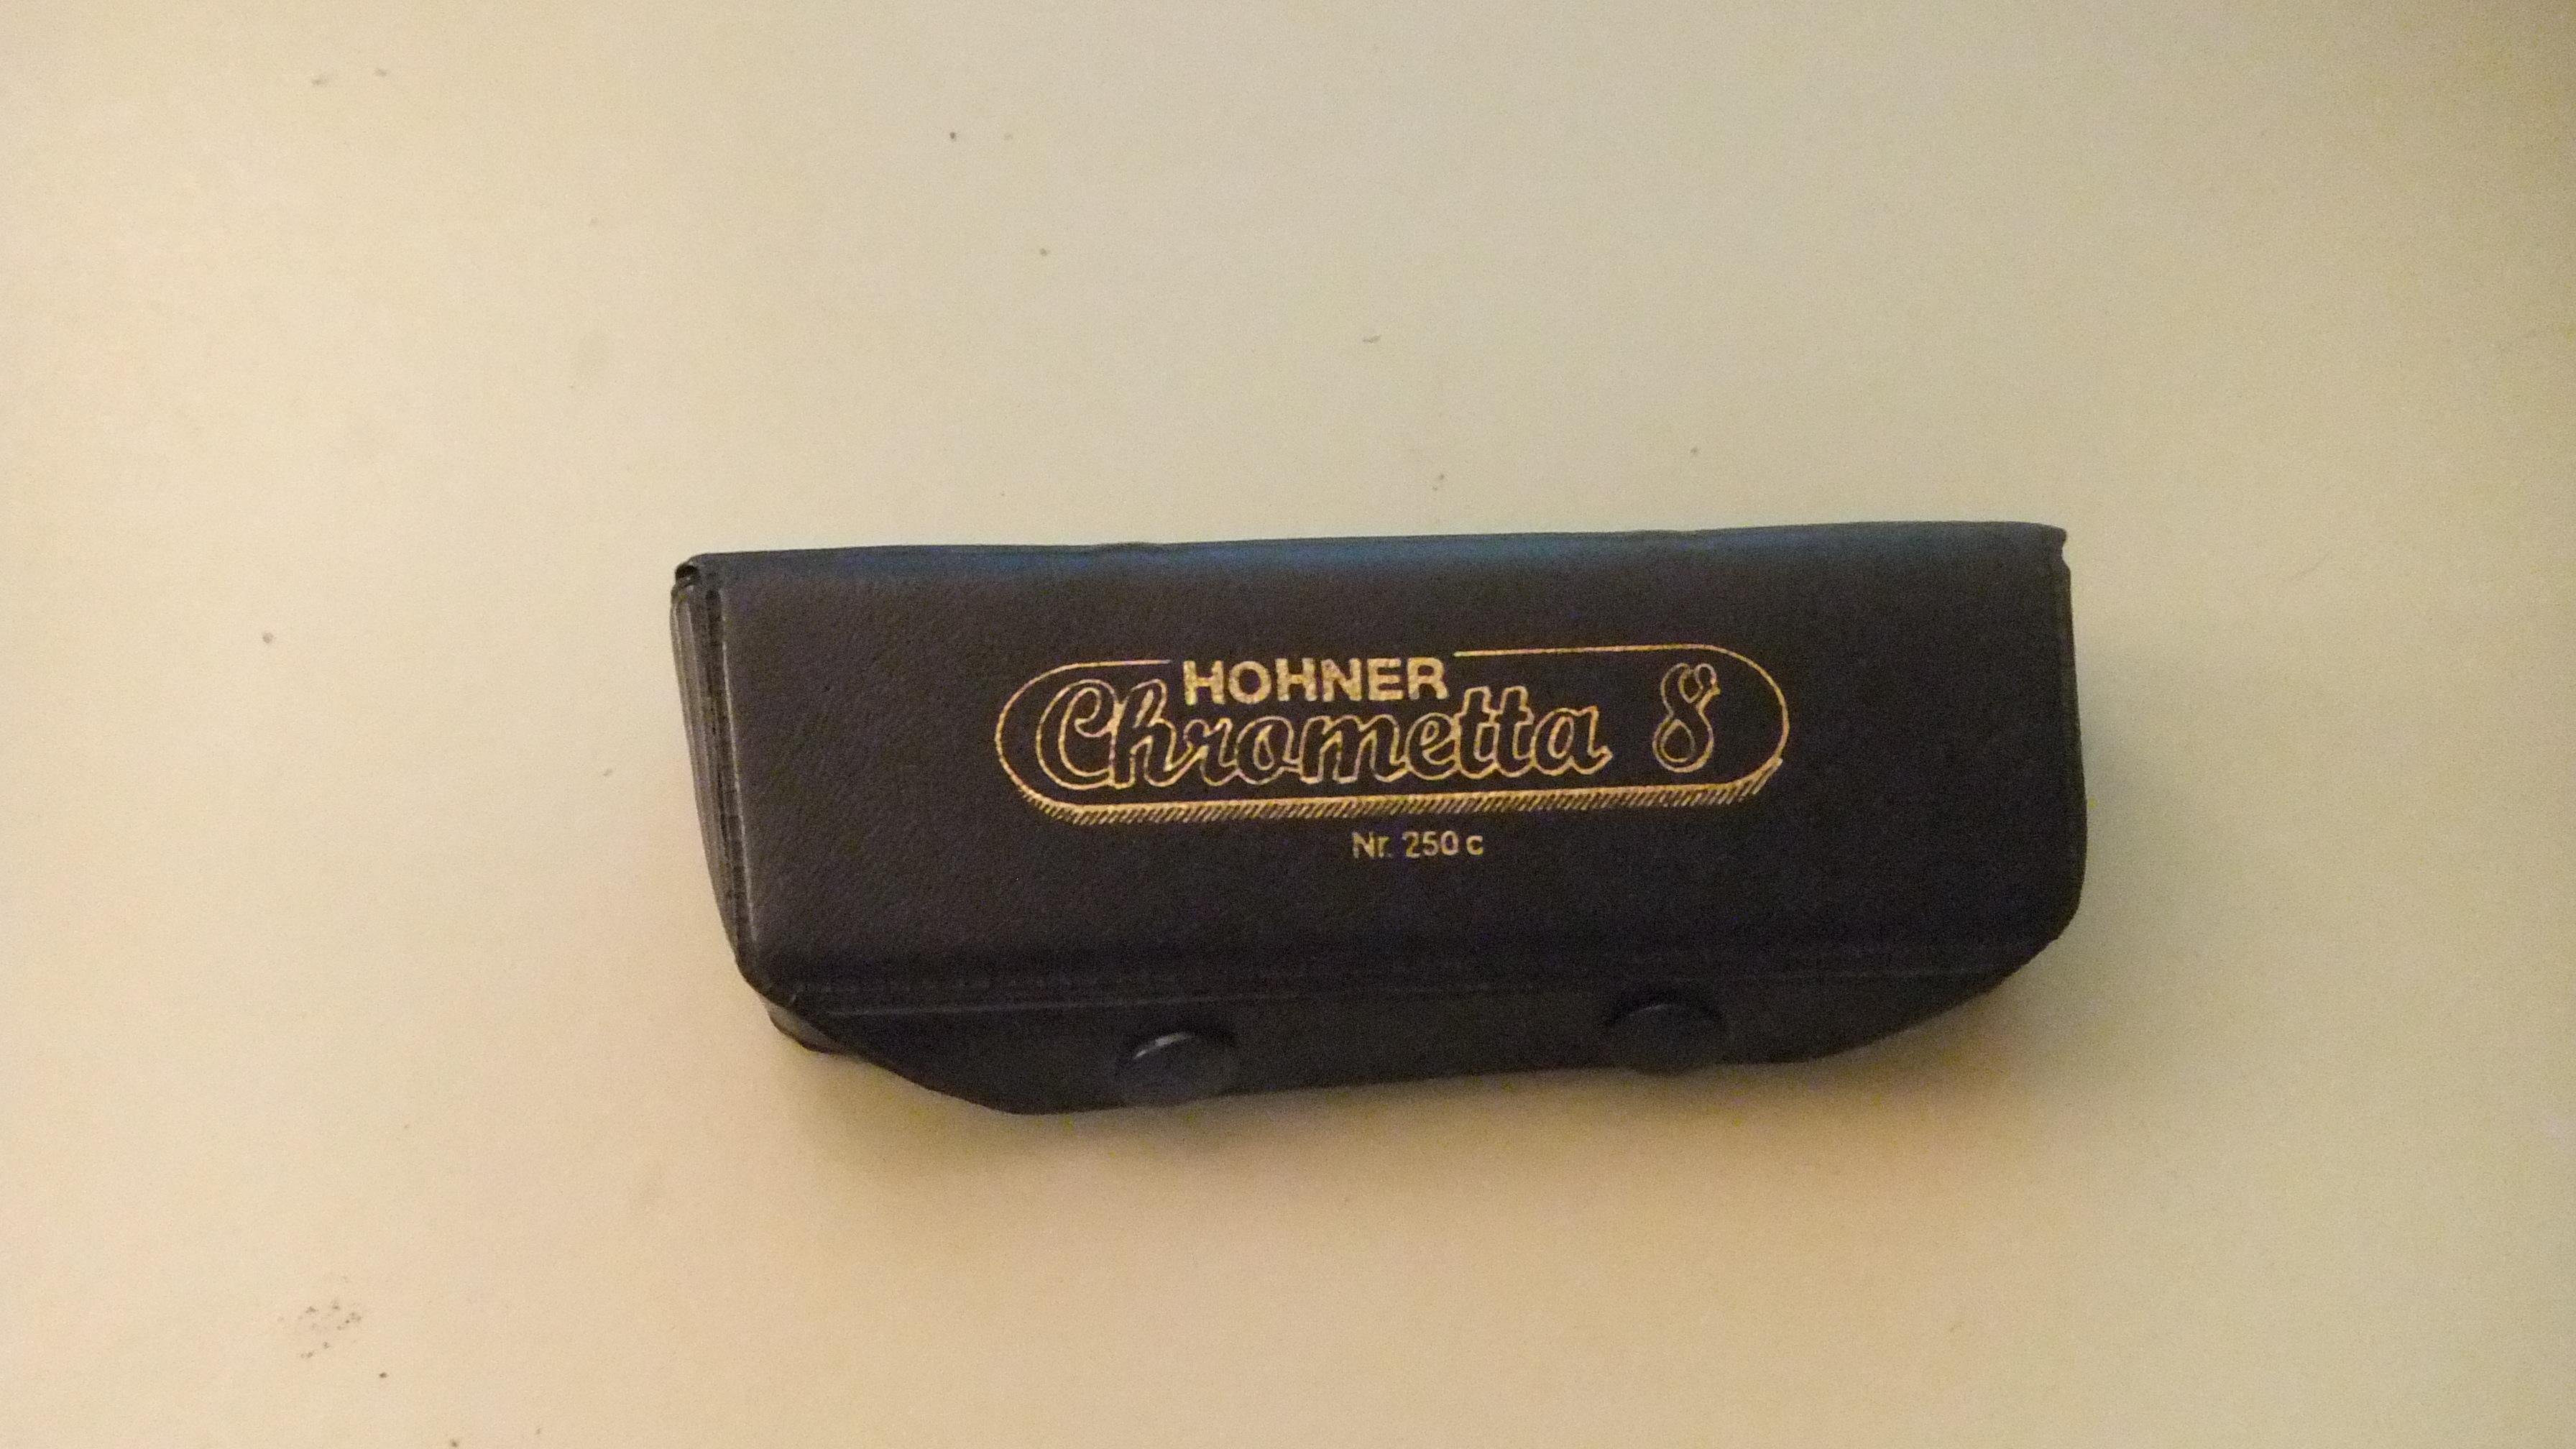 vintage hohner chrometta 8 harmonica